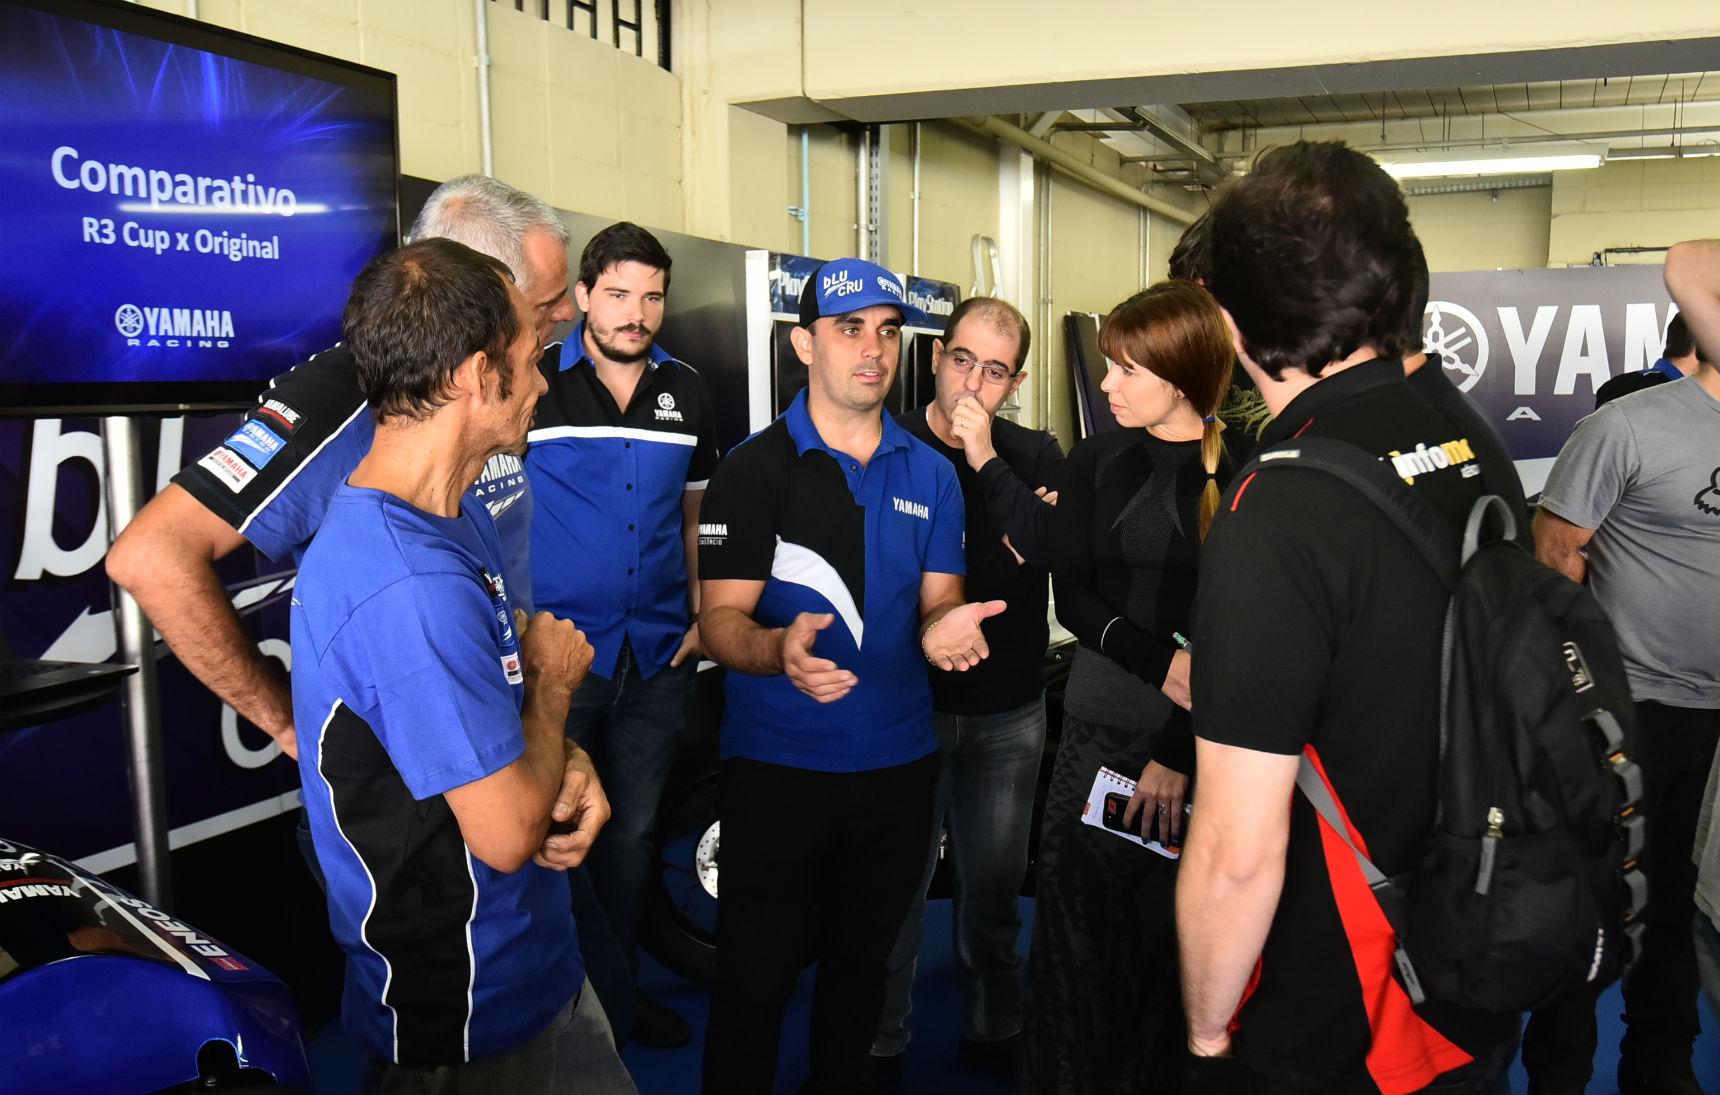 Chefe de equipe do Team PlayStation Yamaha Racing, Alan Douglas